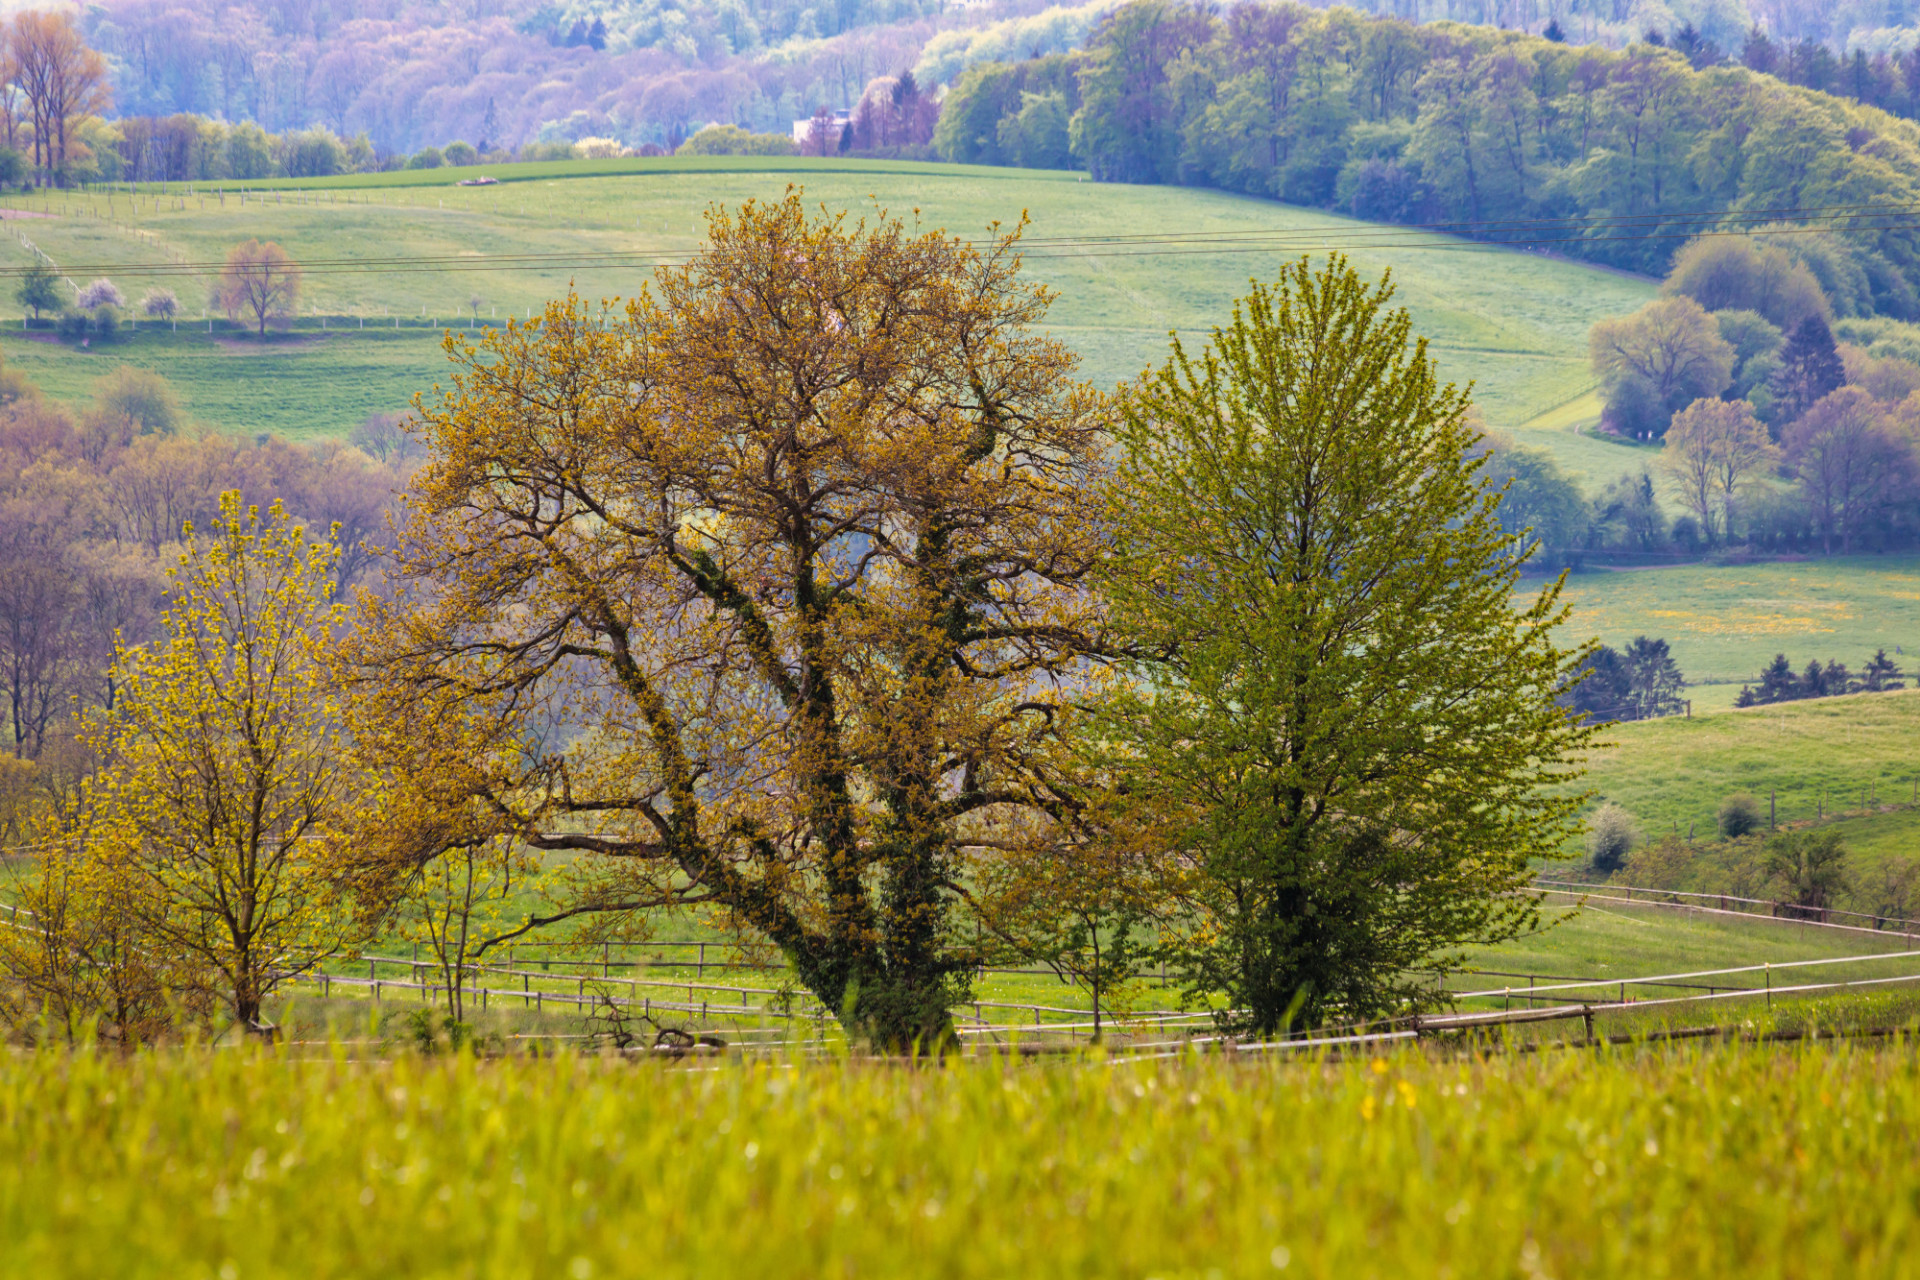 Trees on a rural Landscape